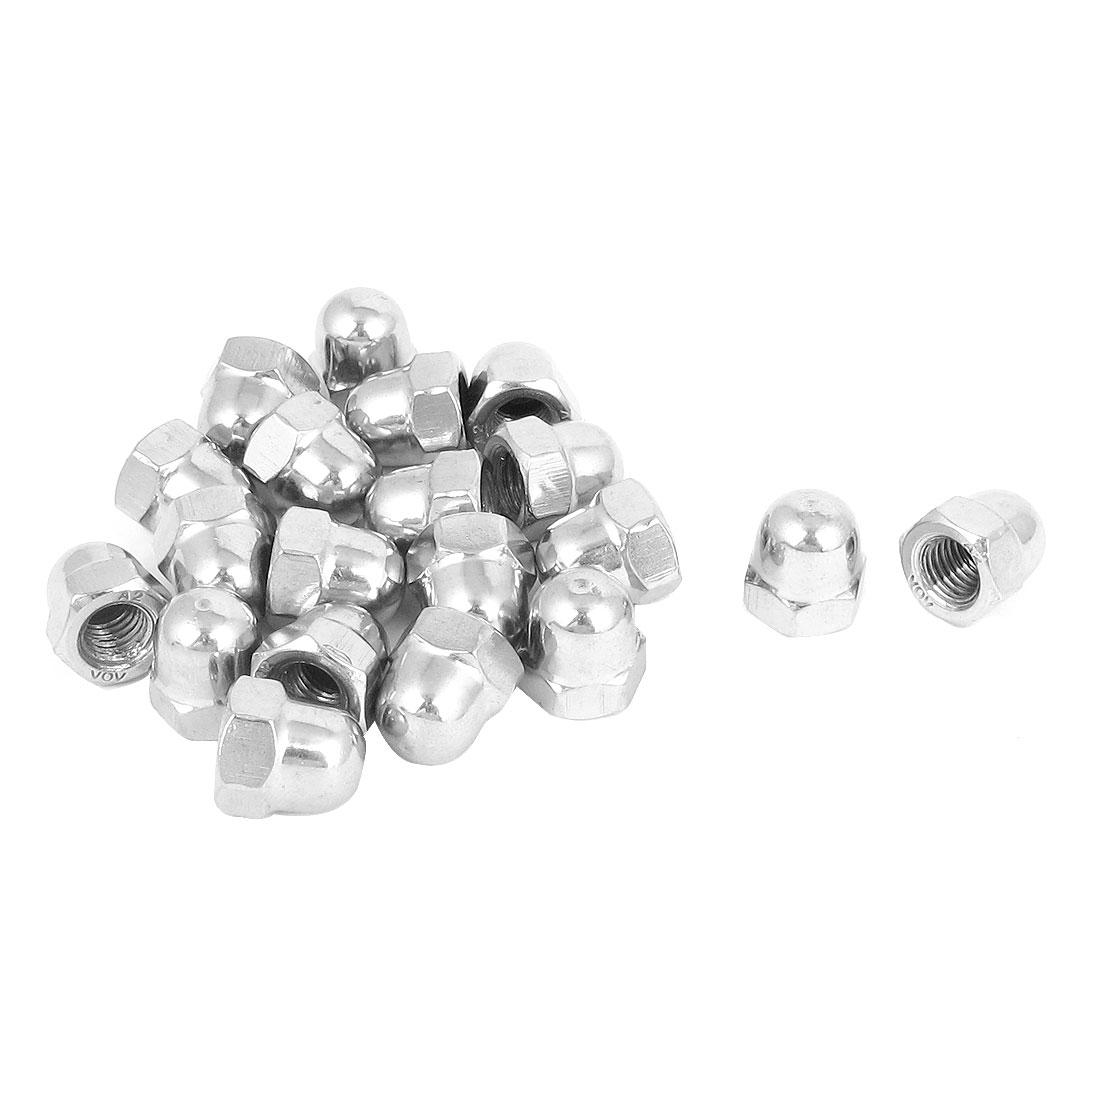 M8 Thread 304 Stainless Steel Acorn Hex Cap Nut Silver Tone 20Pcs